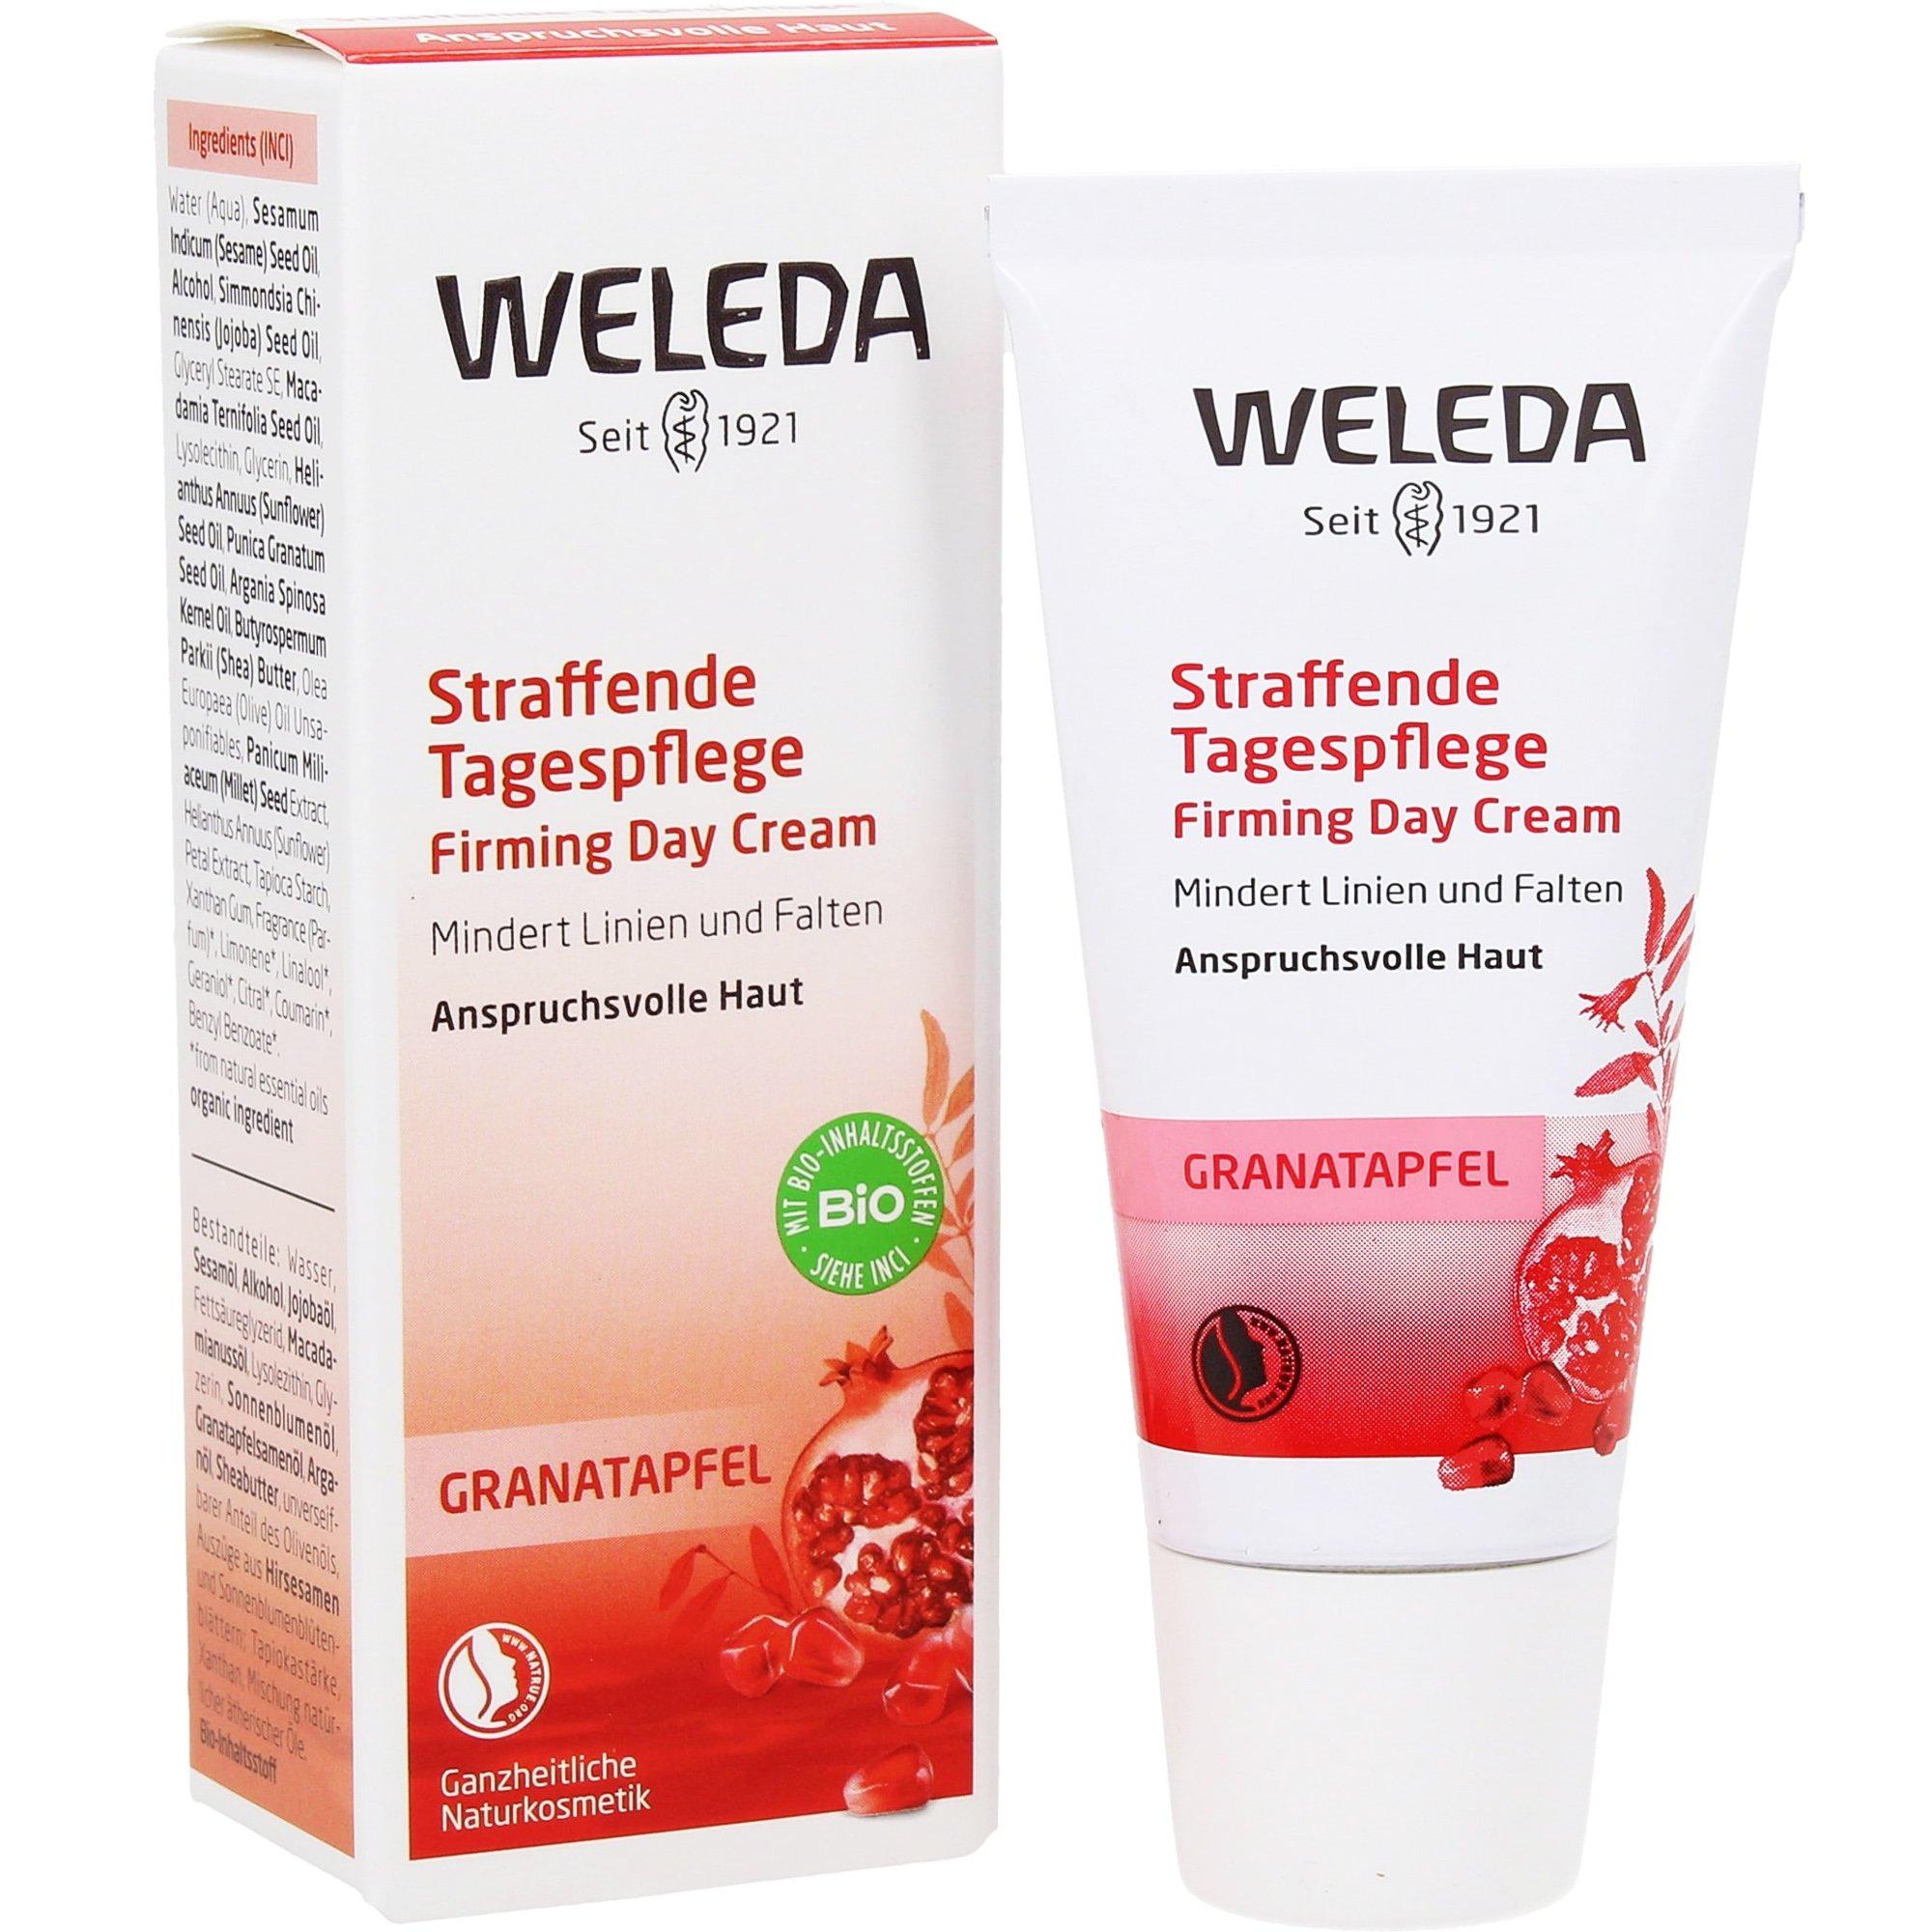 Weleda Pomegranate Firming Day Cream Συσφιγκτική Κρέμα Ημέρας με Ρόδι για Ανανέωση, Προστασία & Λαμπερό Δέρμα 30ml